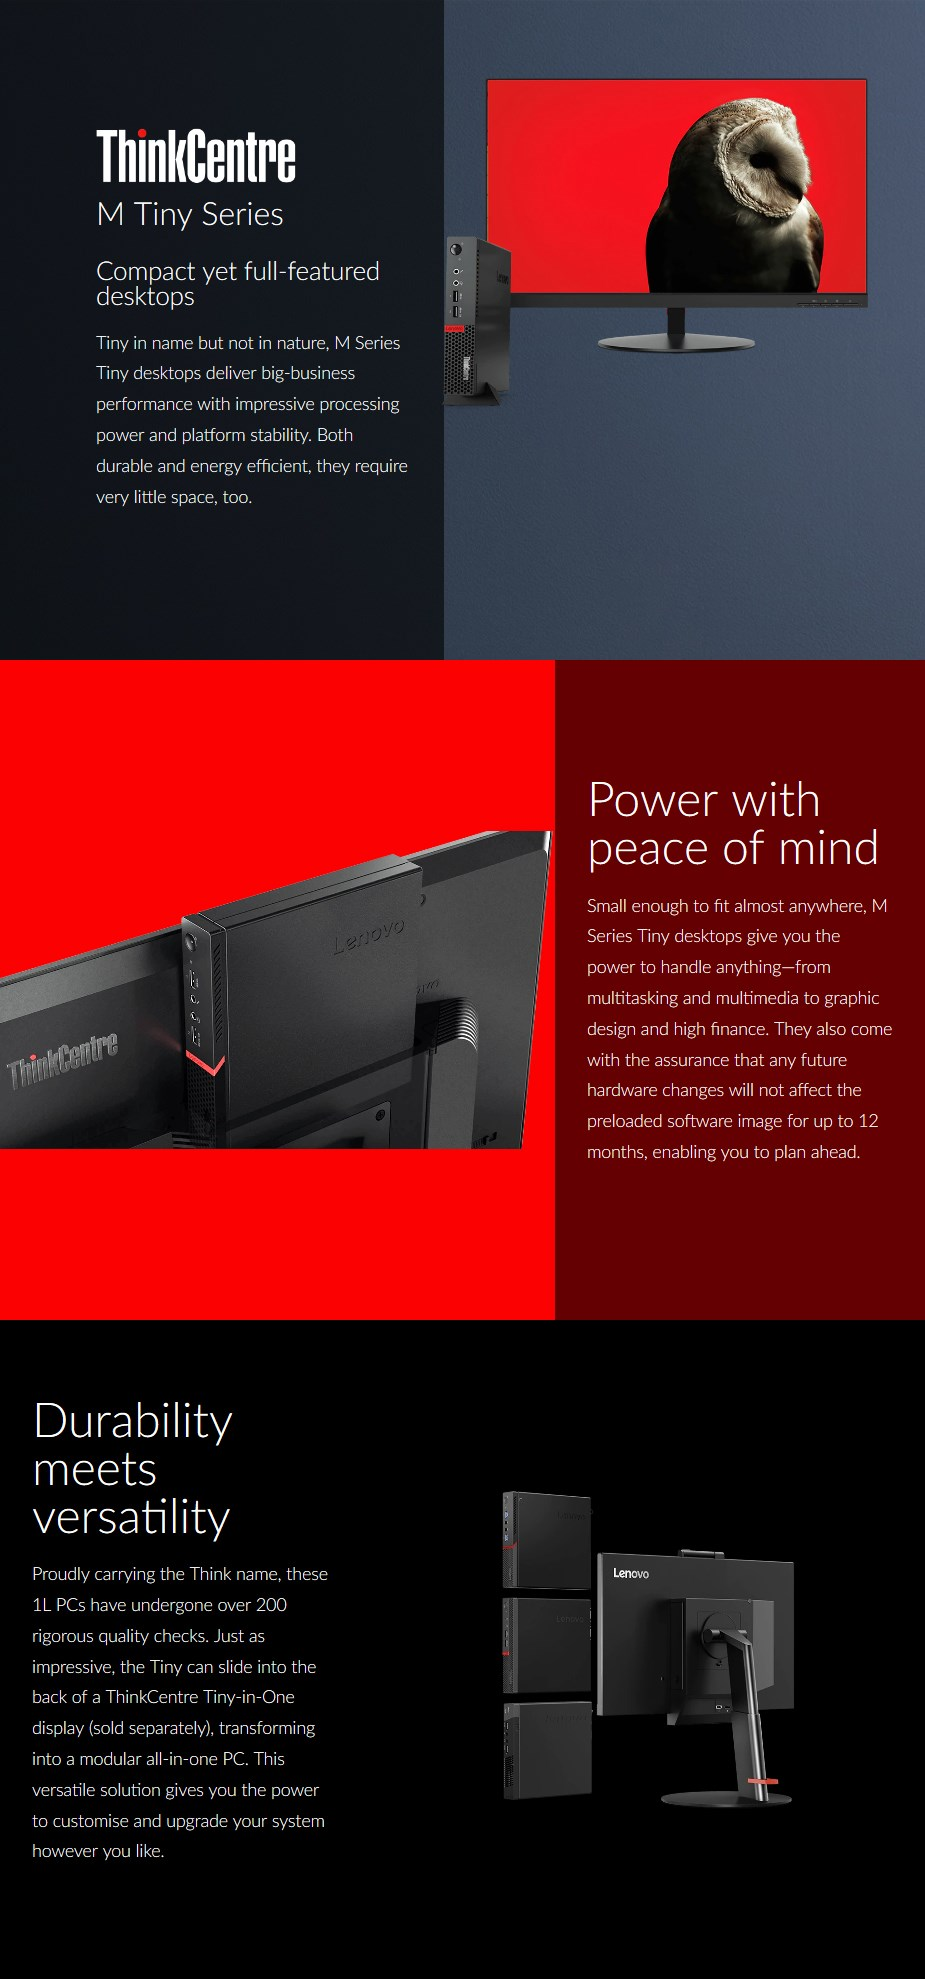 Lenovo ThinkCentre M920 Tiny PC i5-9500T 16GB 512GB Win10 Pro - Desktop Overview 1